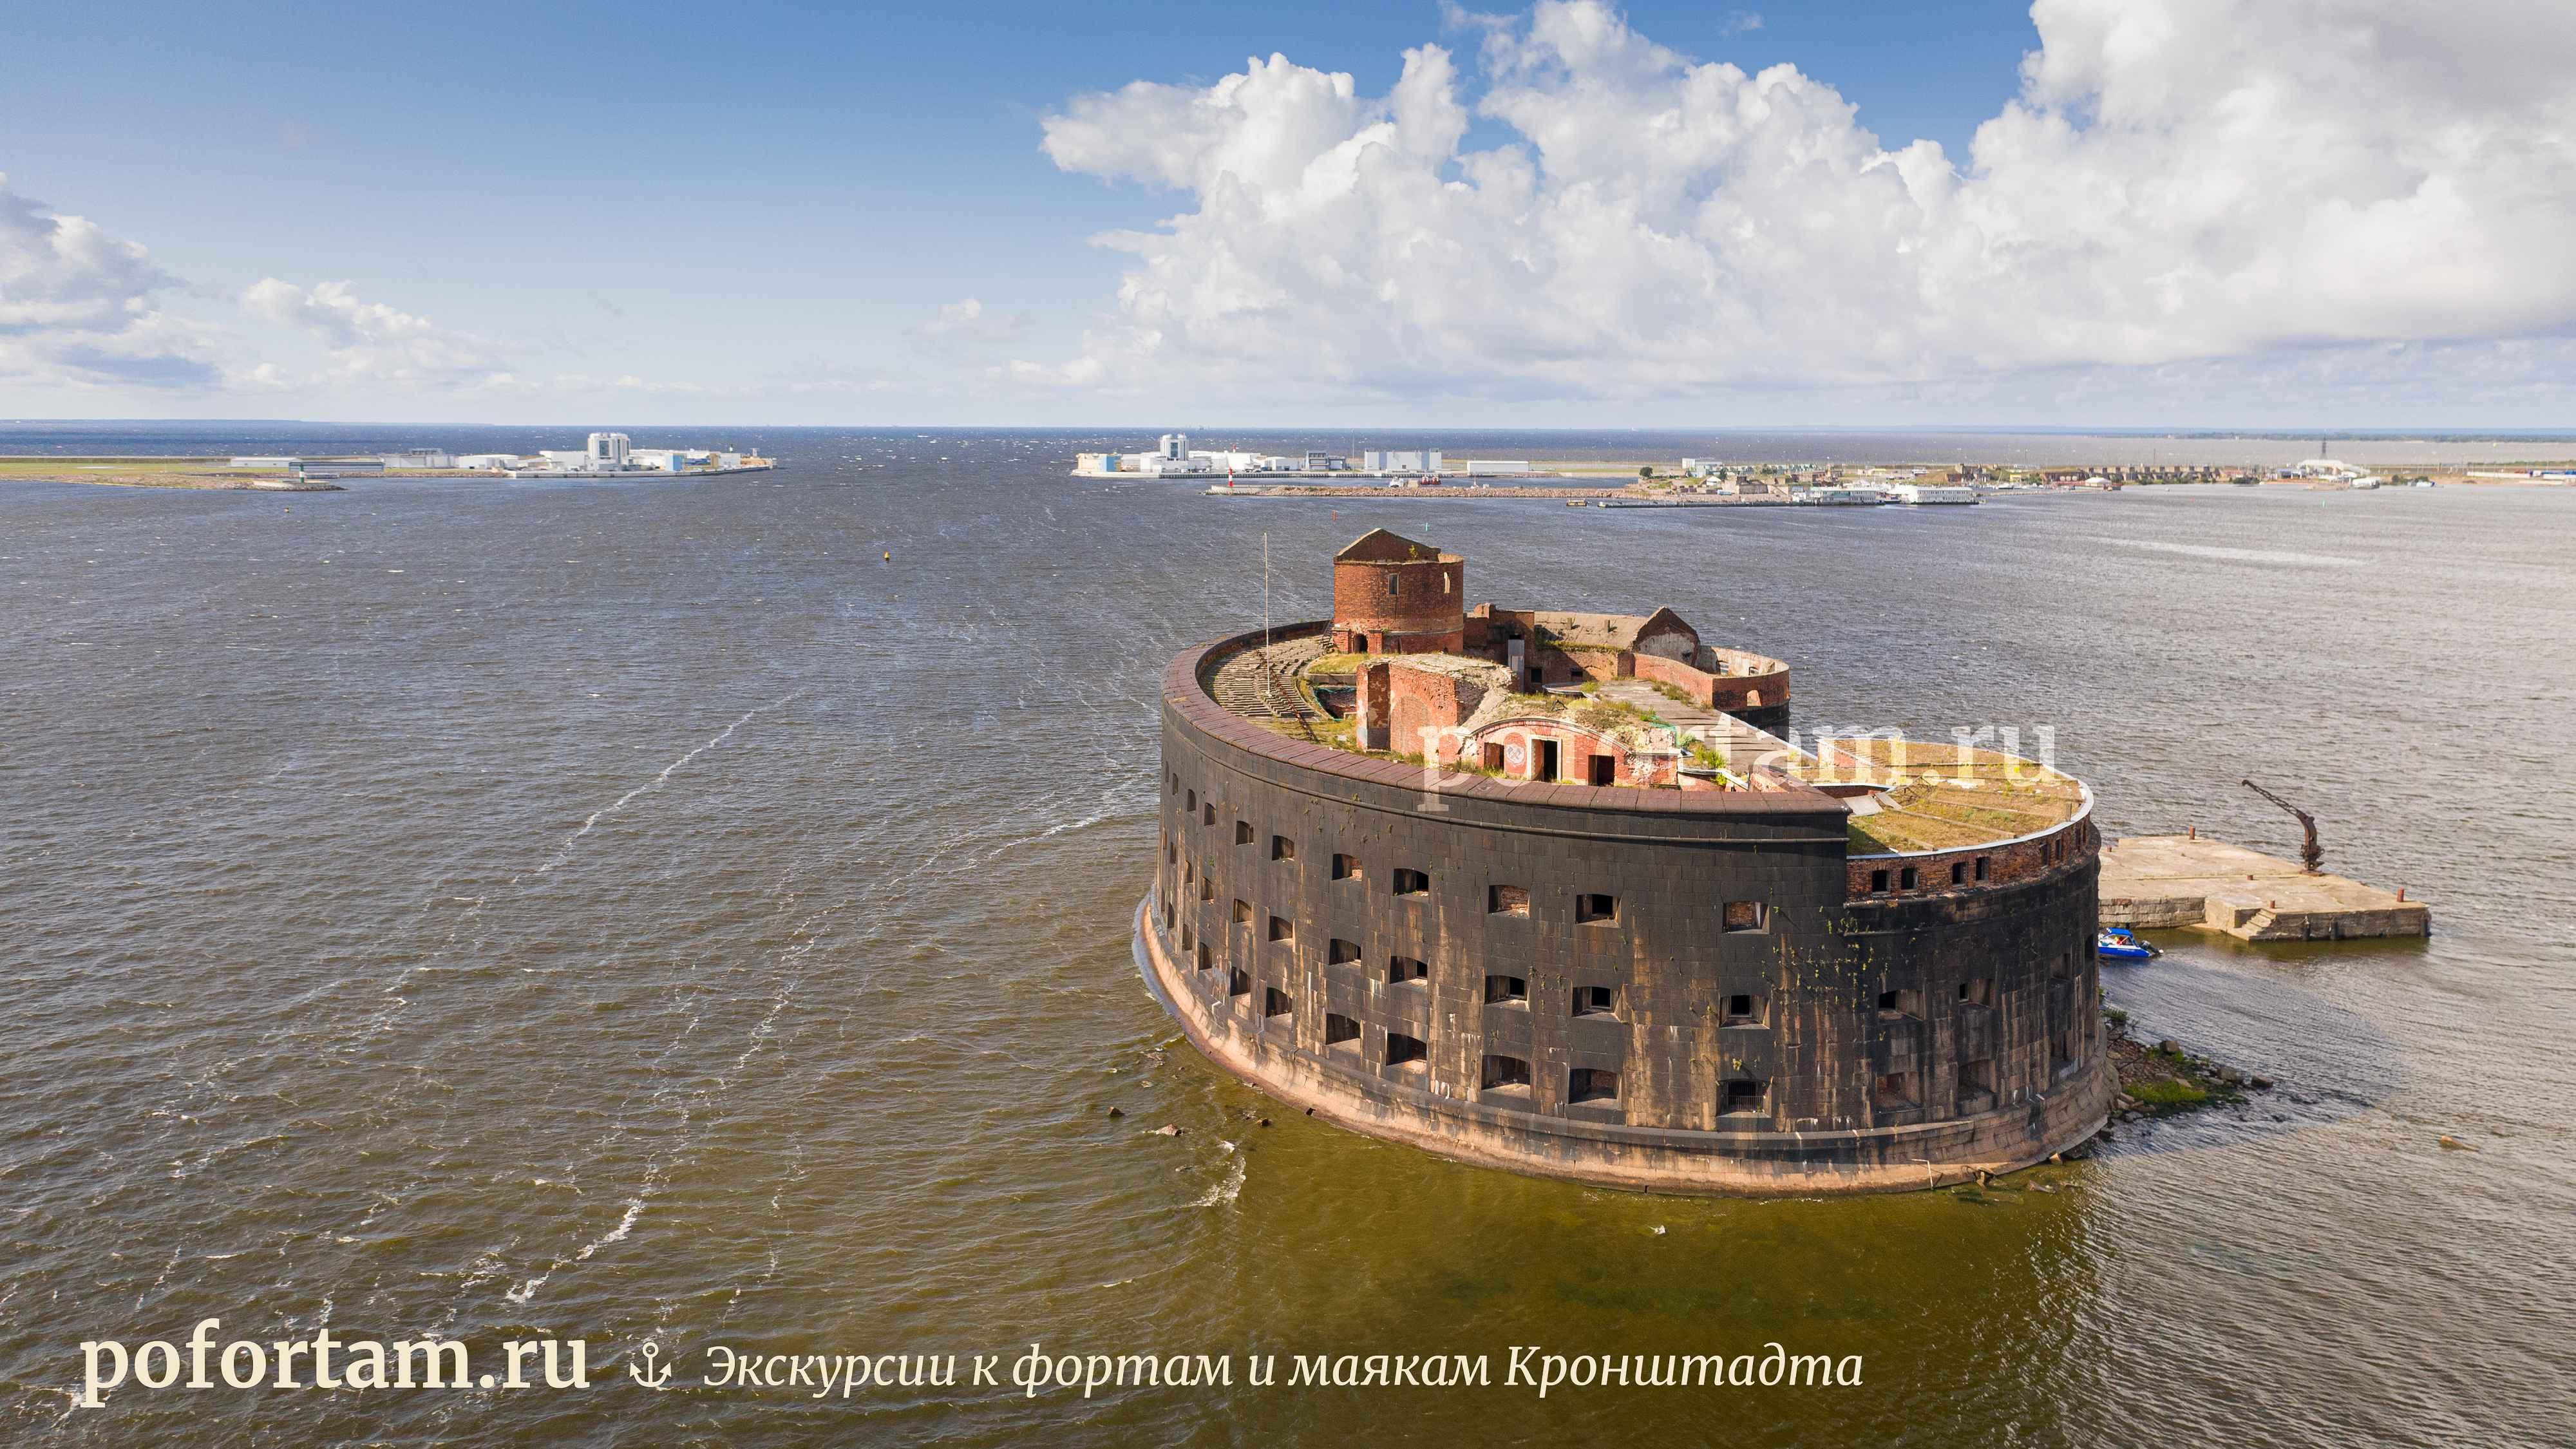 Форт Александр: фото сверху 4k